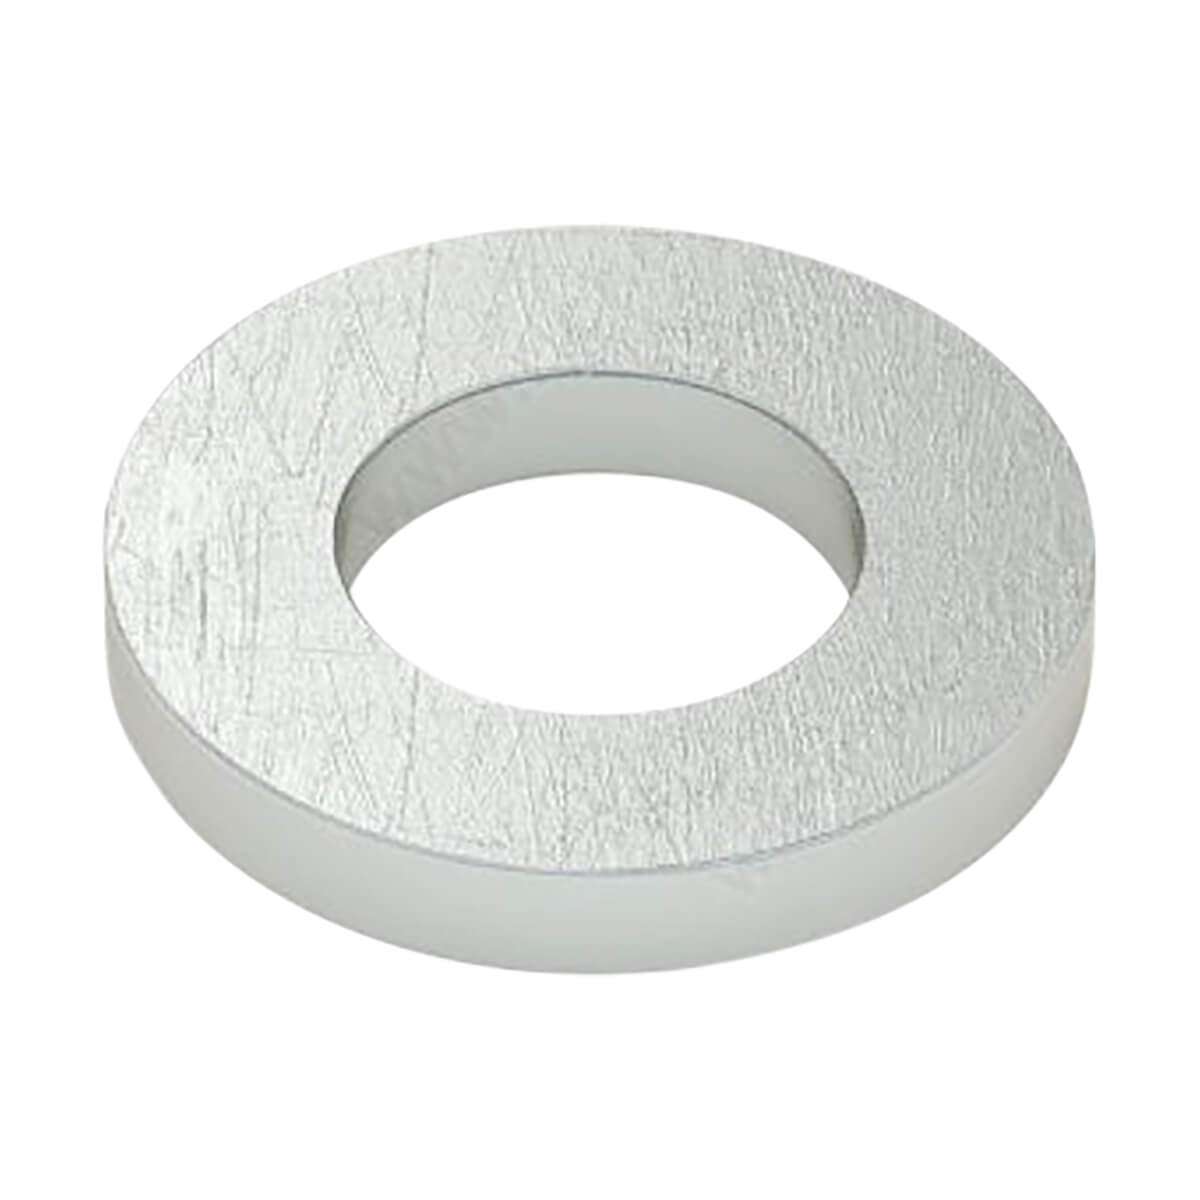 Metric Flat Ring - M5 - 6 Pack